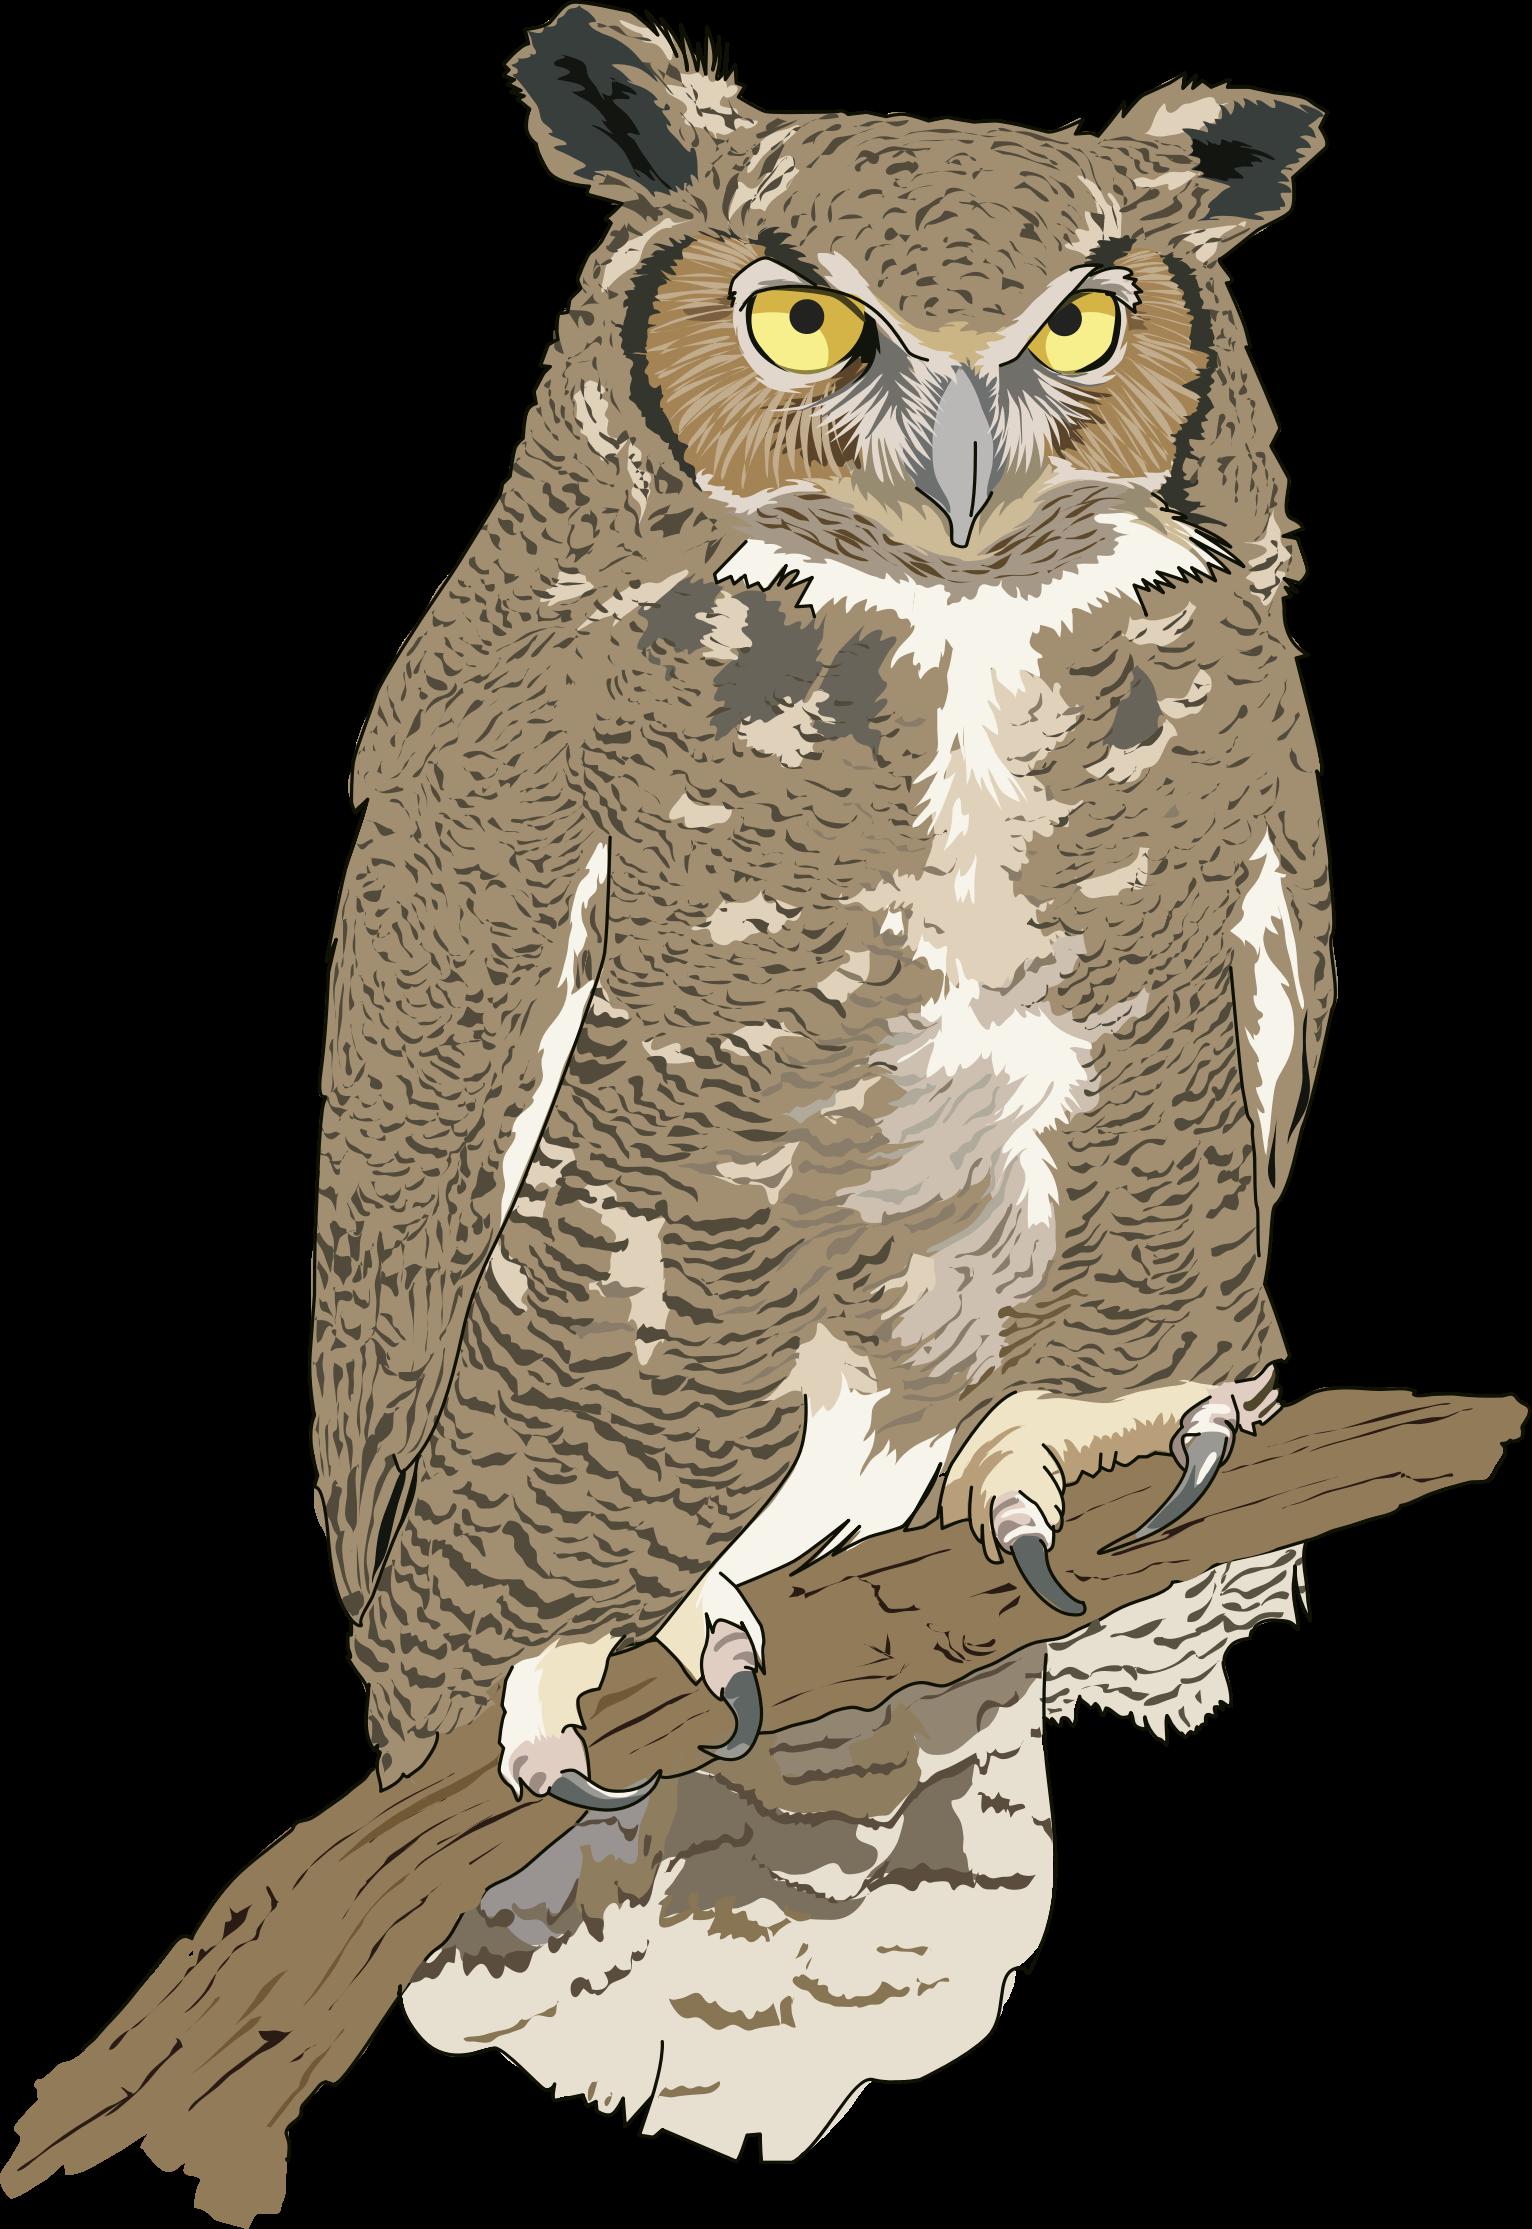 Eagle owl clipart - Clipground